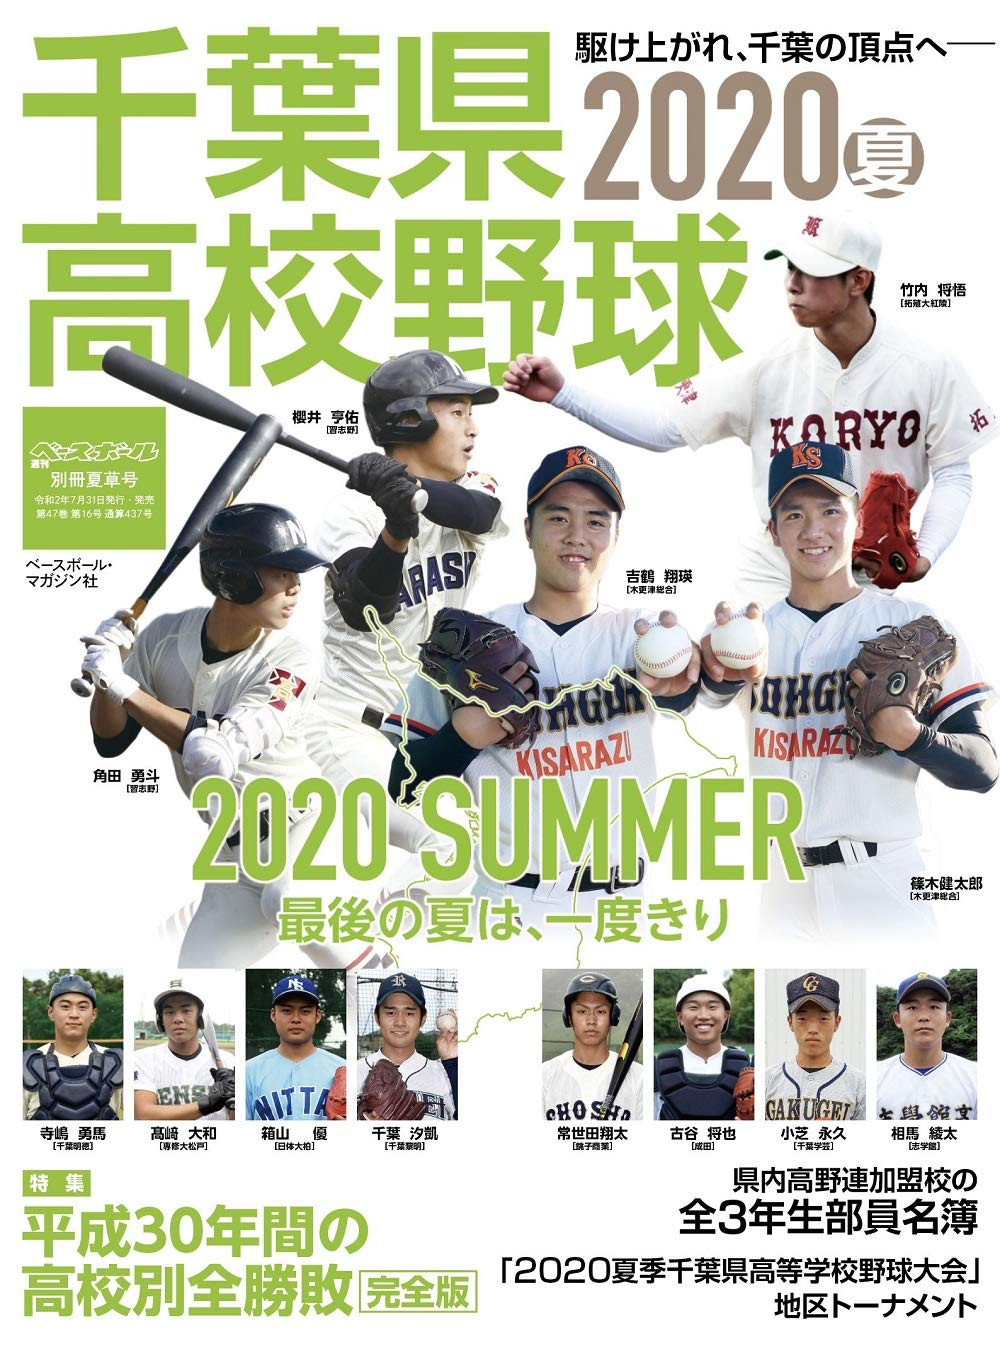 高校 野球 県 選手 千葉 注目 千葉県夏の高校野球2021!優勝候補予想や注目選手を徹底調査